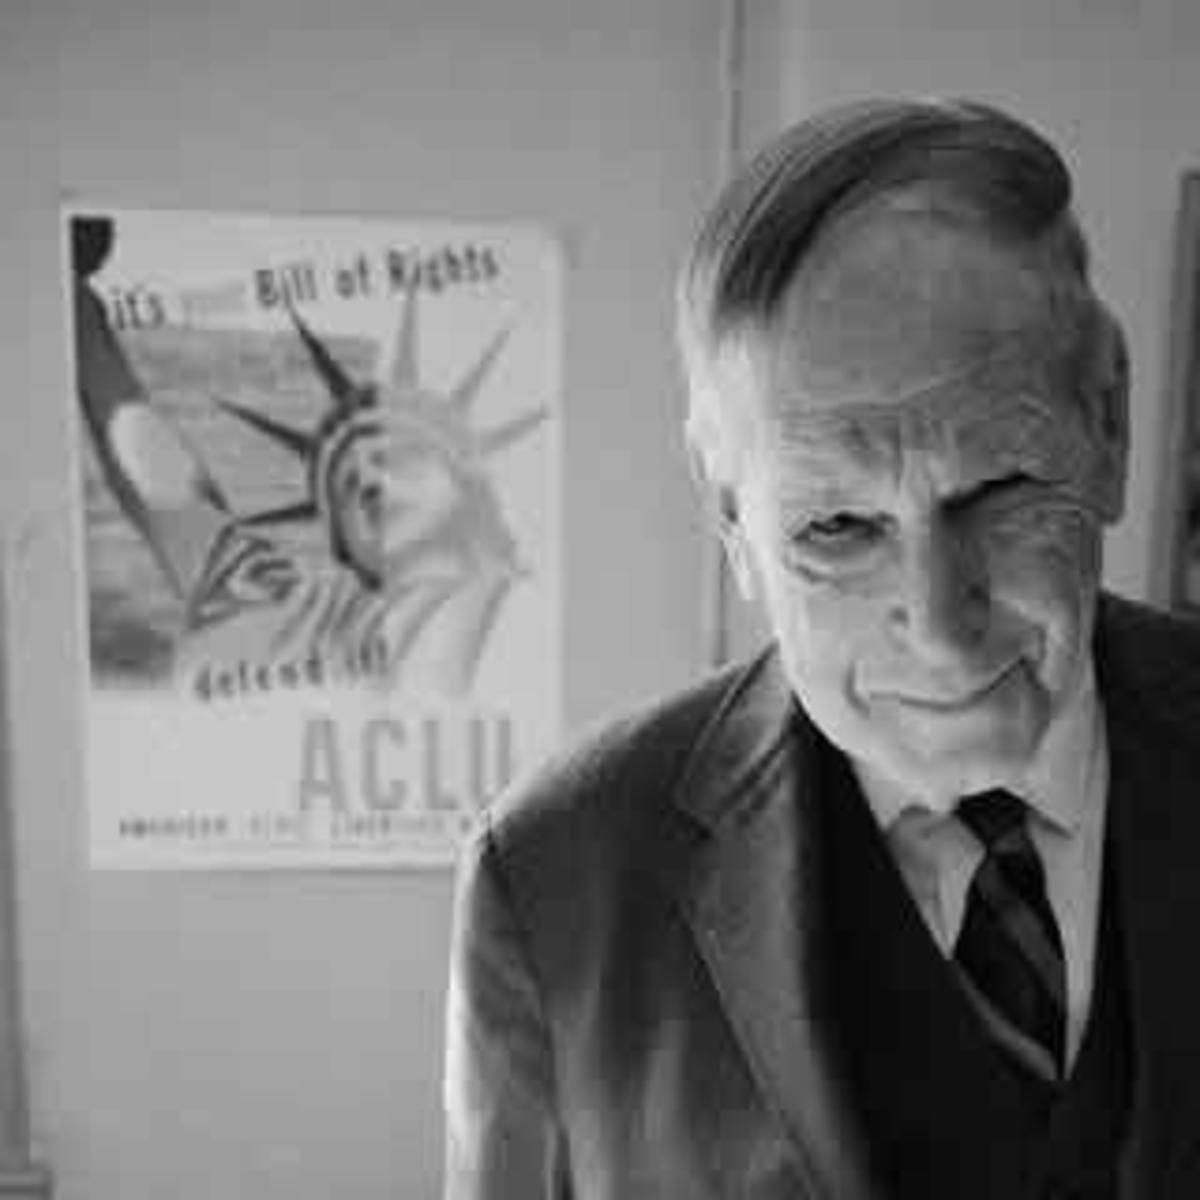 ROGER BALDWIN—FOUNDER OF ACLU